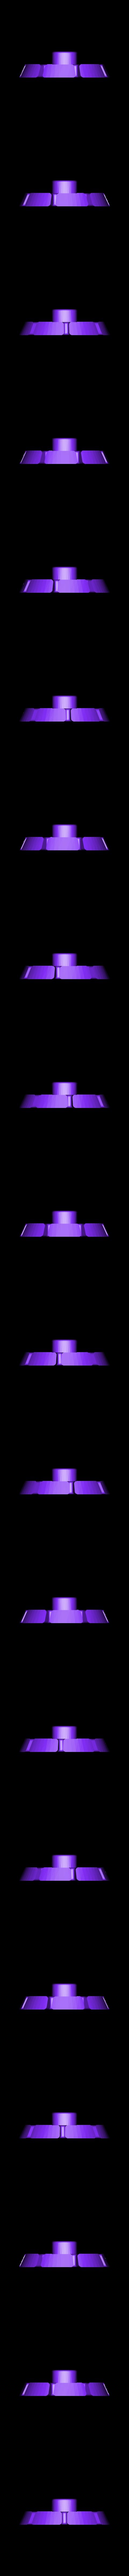 Pièce2.STL Download STL file HELP CUTTING CAKE PART CUTTING • 3D printer object, GuilhemPerroud